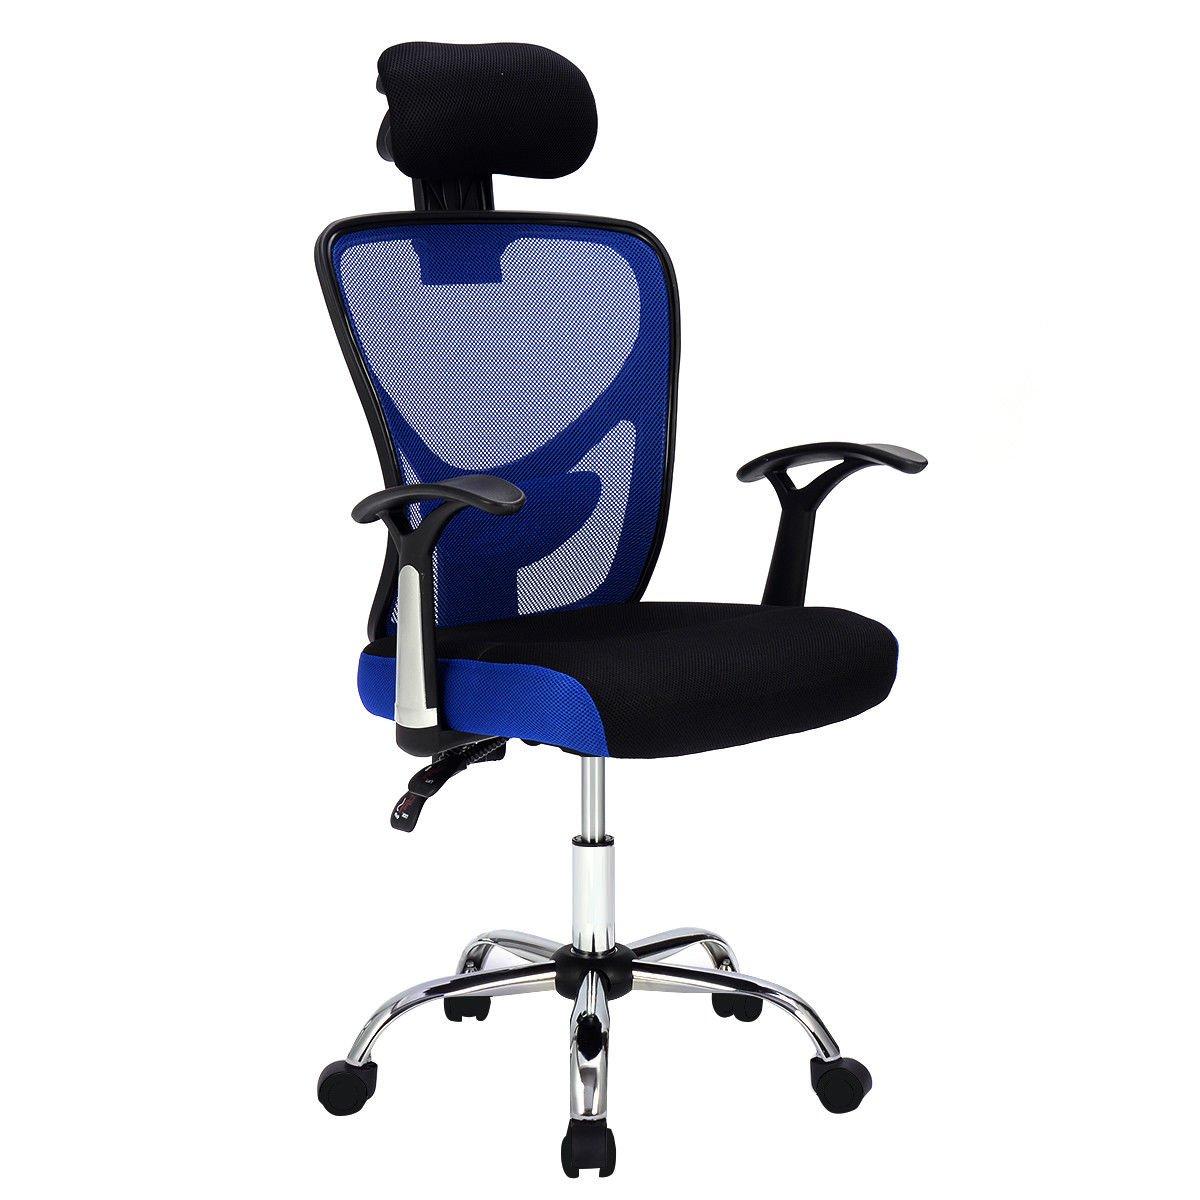 Giantex Executive Office Chair Mesh High Back Home Adjustable Swivel Ergonomic Computer Desk Chair with Headrest (Blue)